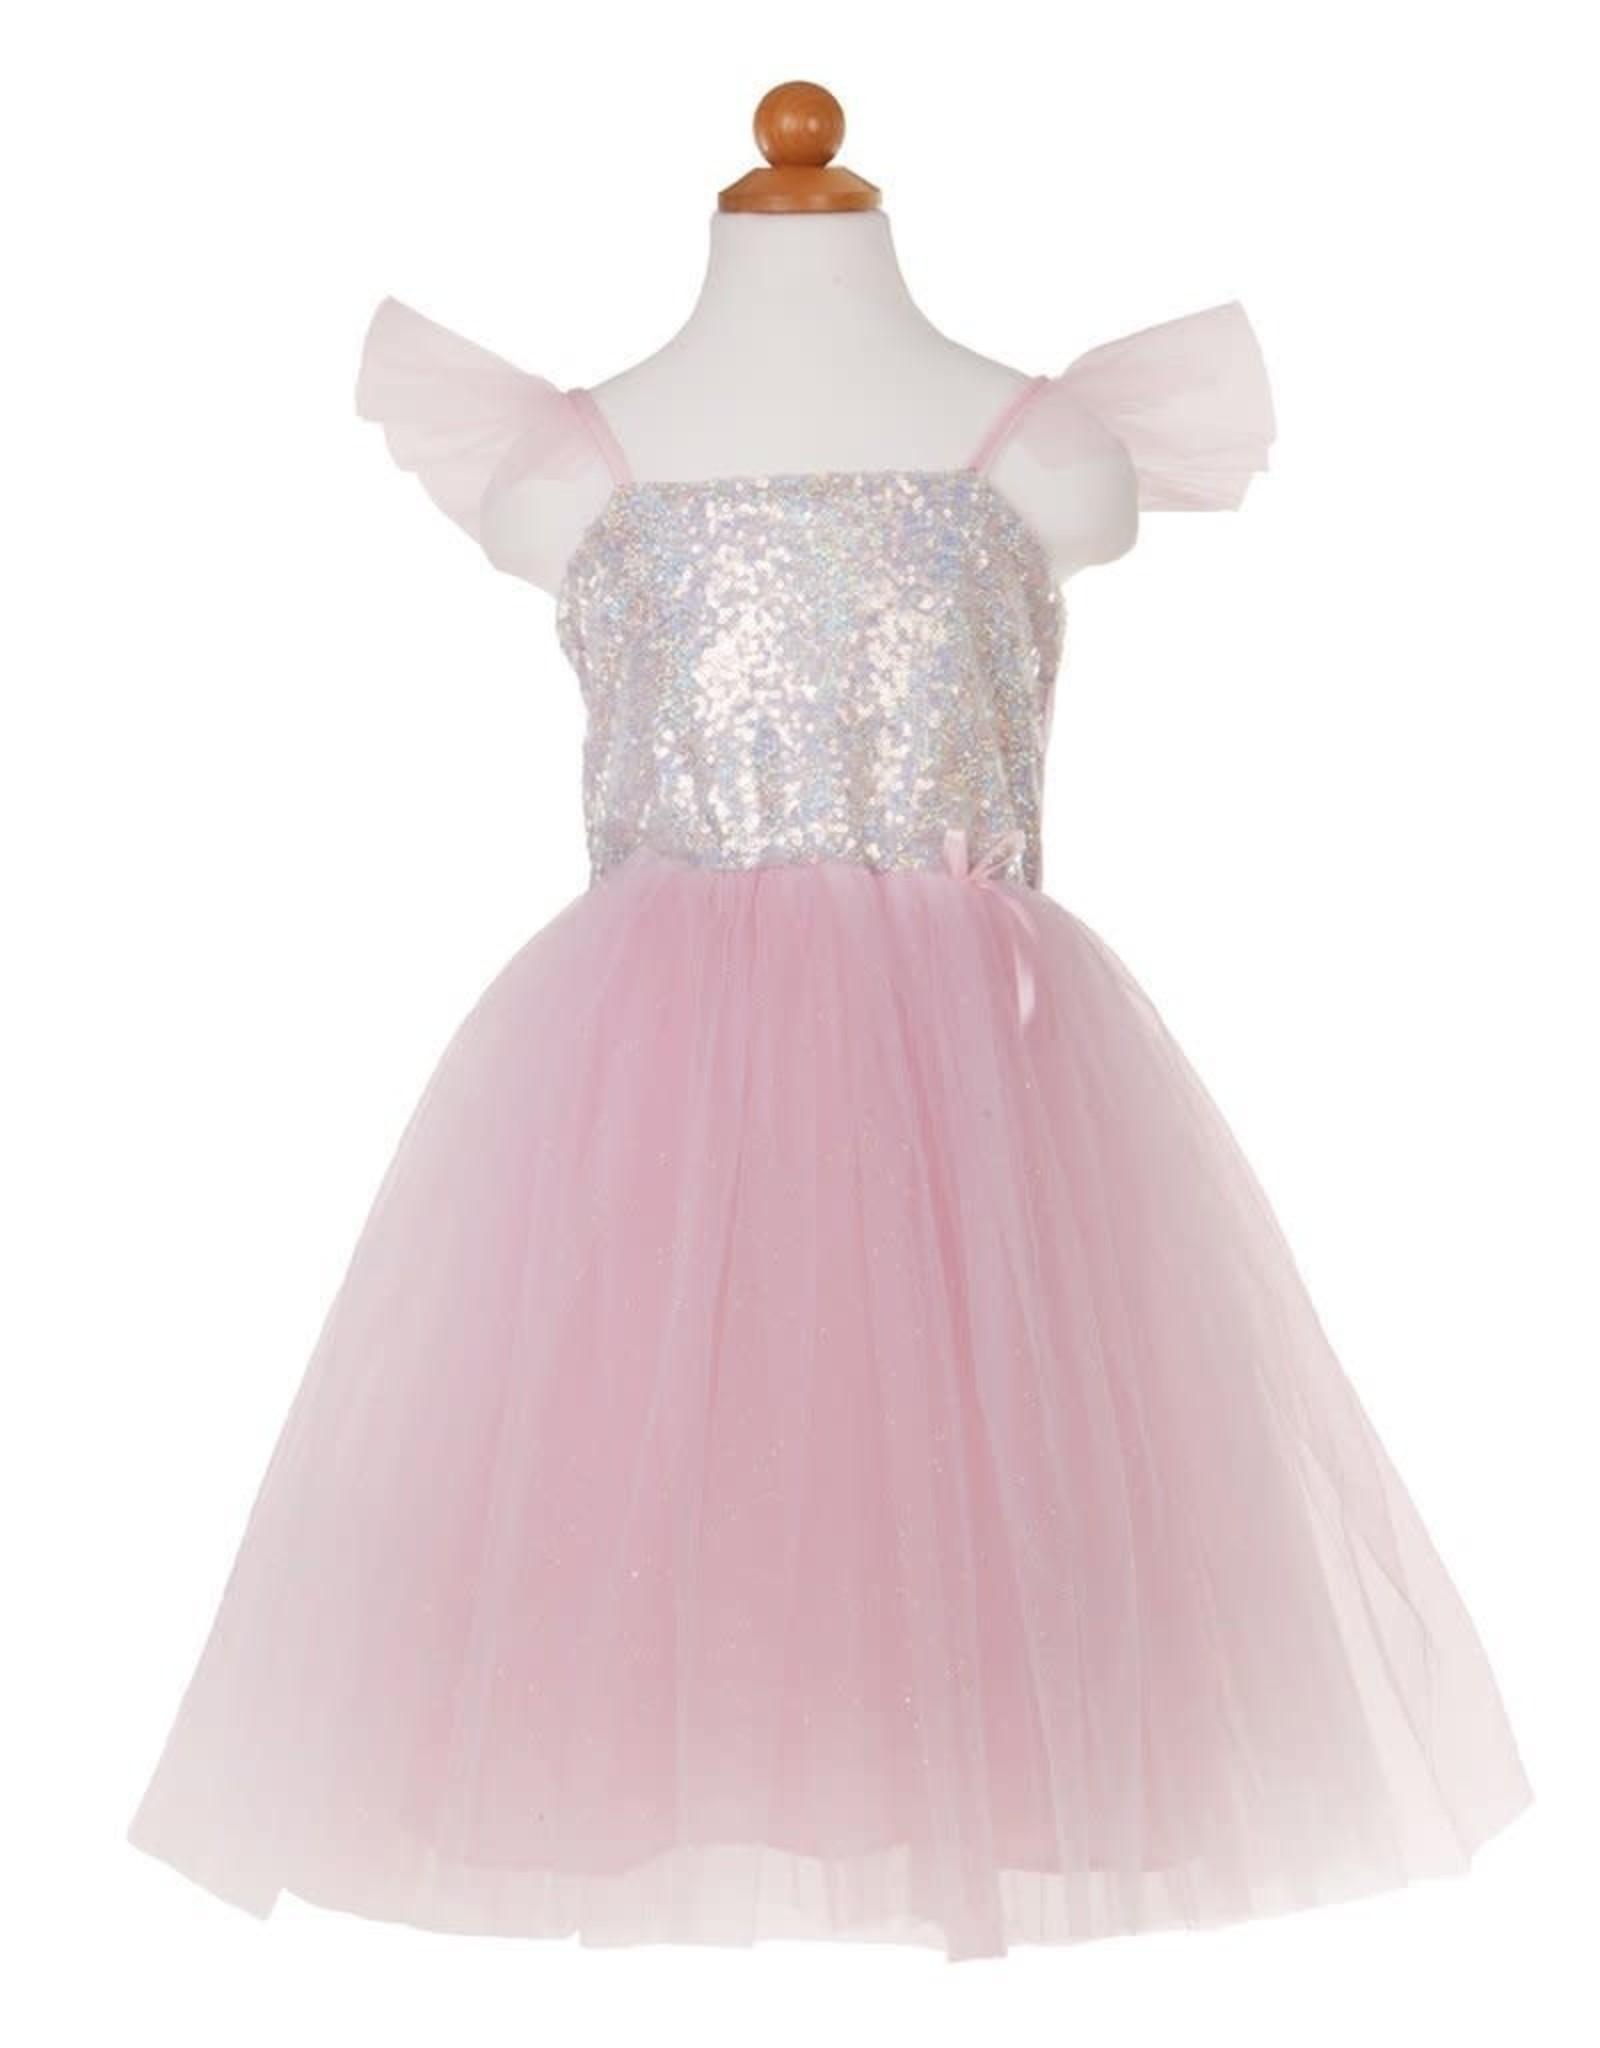 Great Pretenders Sequins Princess Dress, Silver, Size 5-6